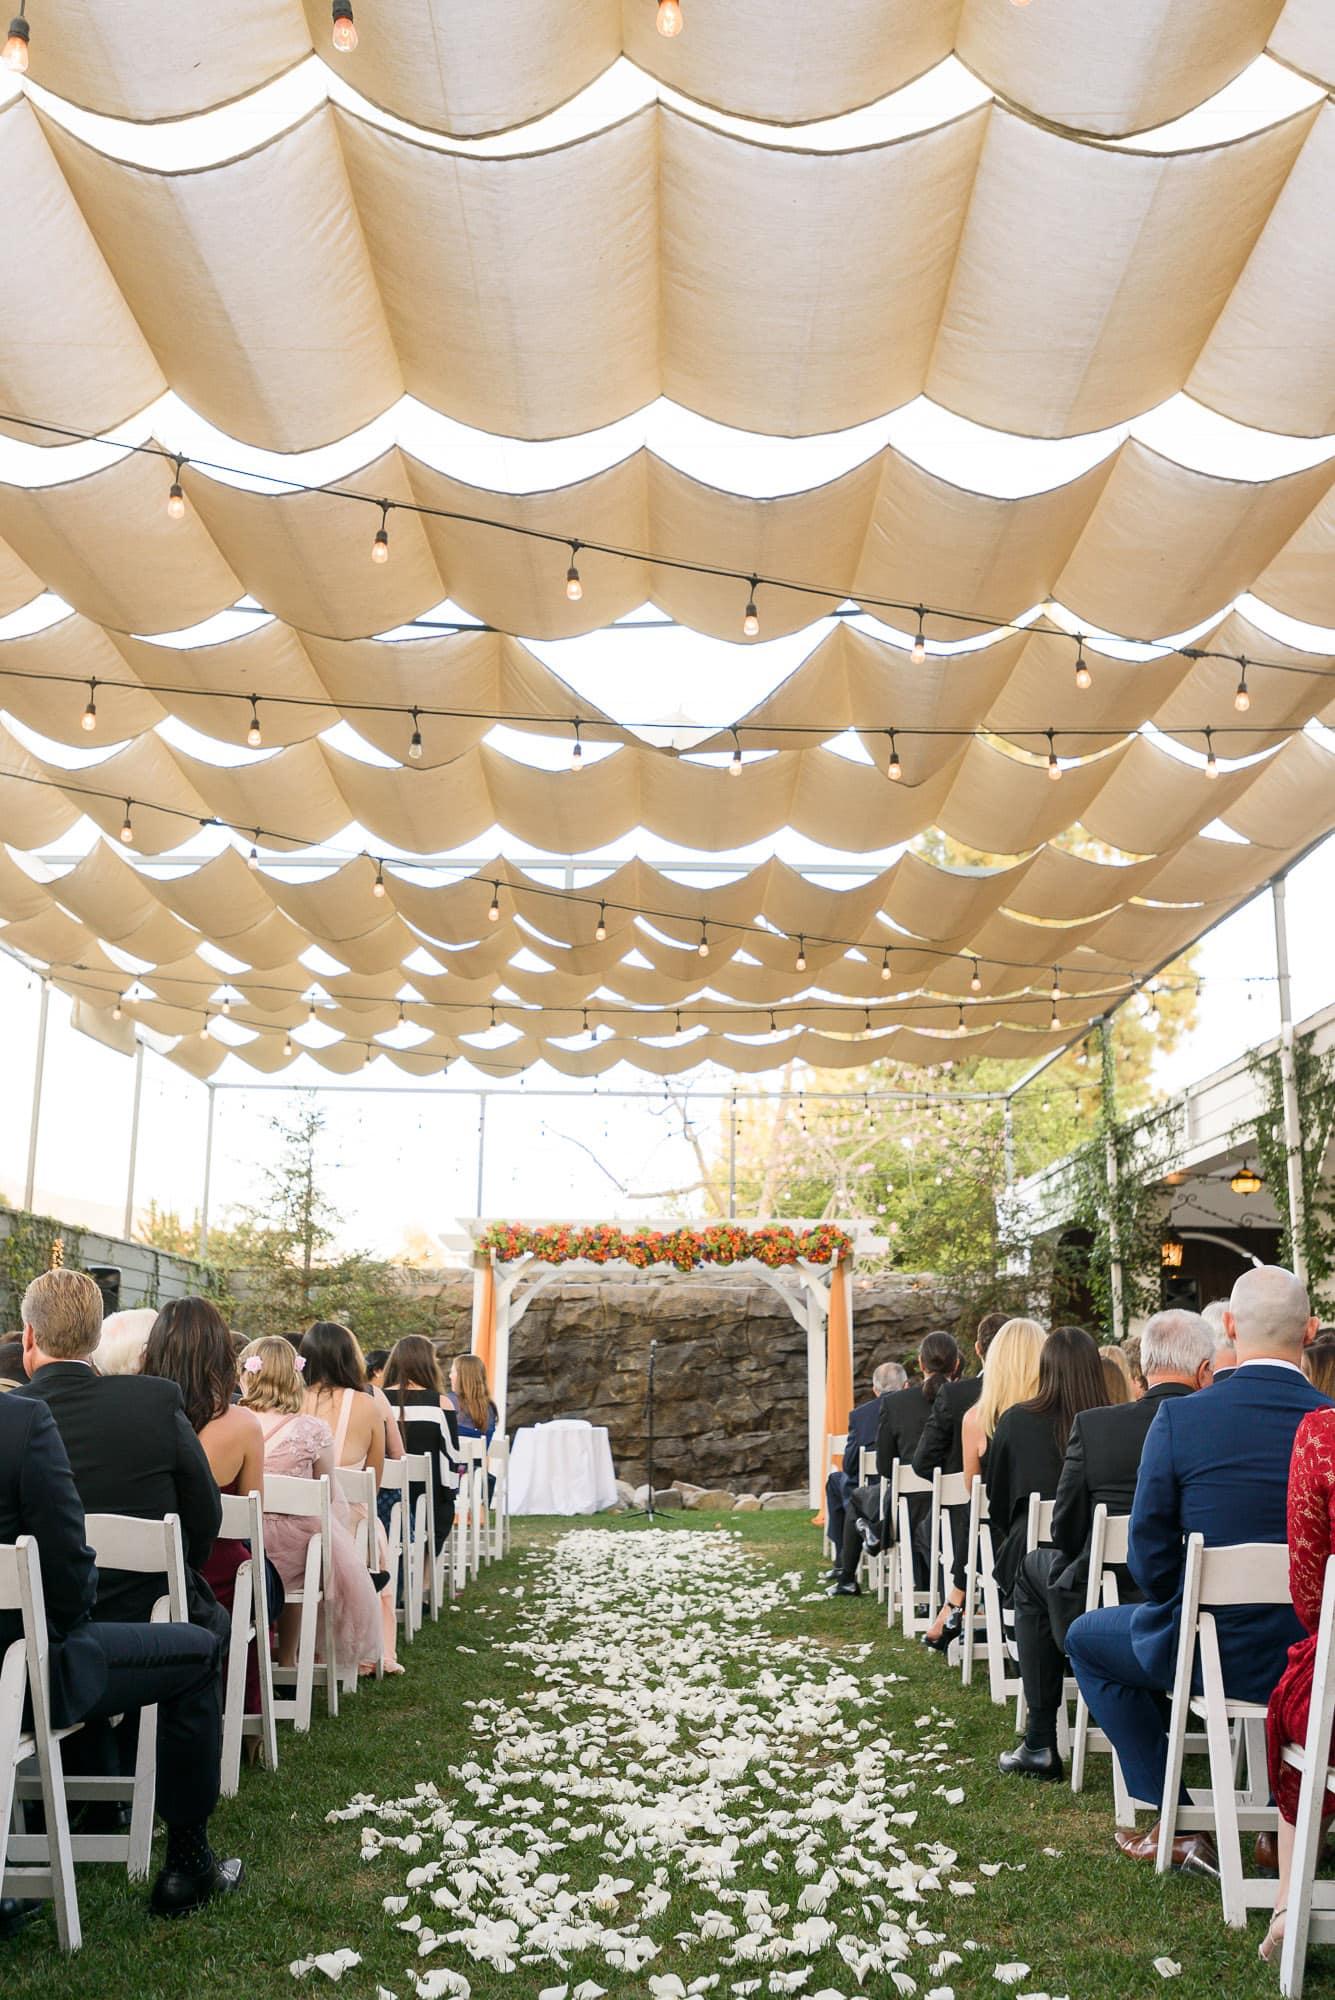 039_Alan_and_Heidi_Los_Angeles_Equestrian_Center_Wedding